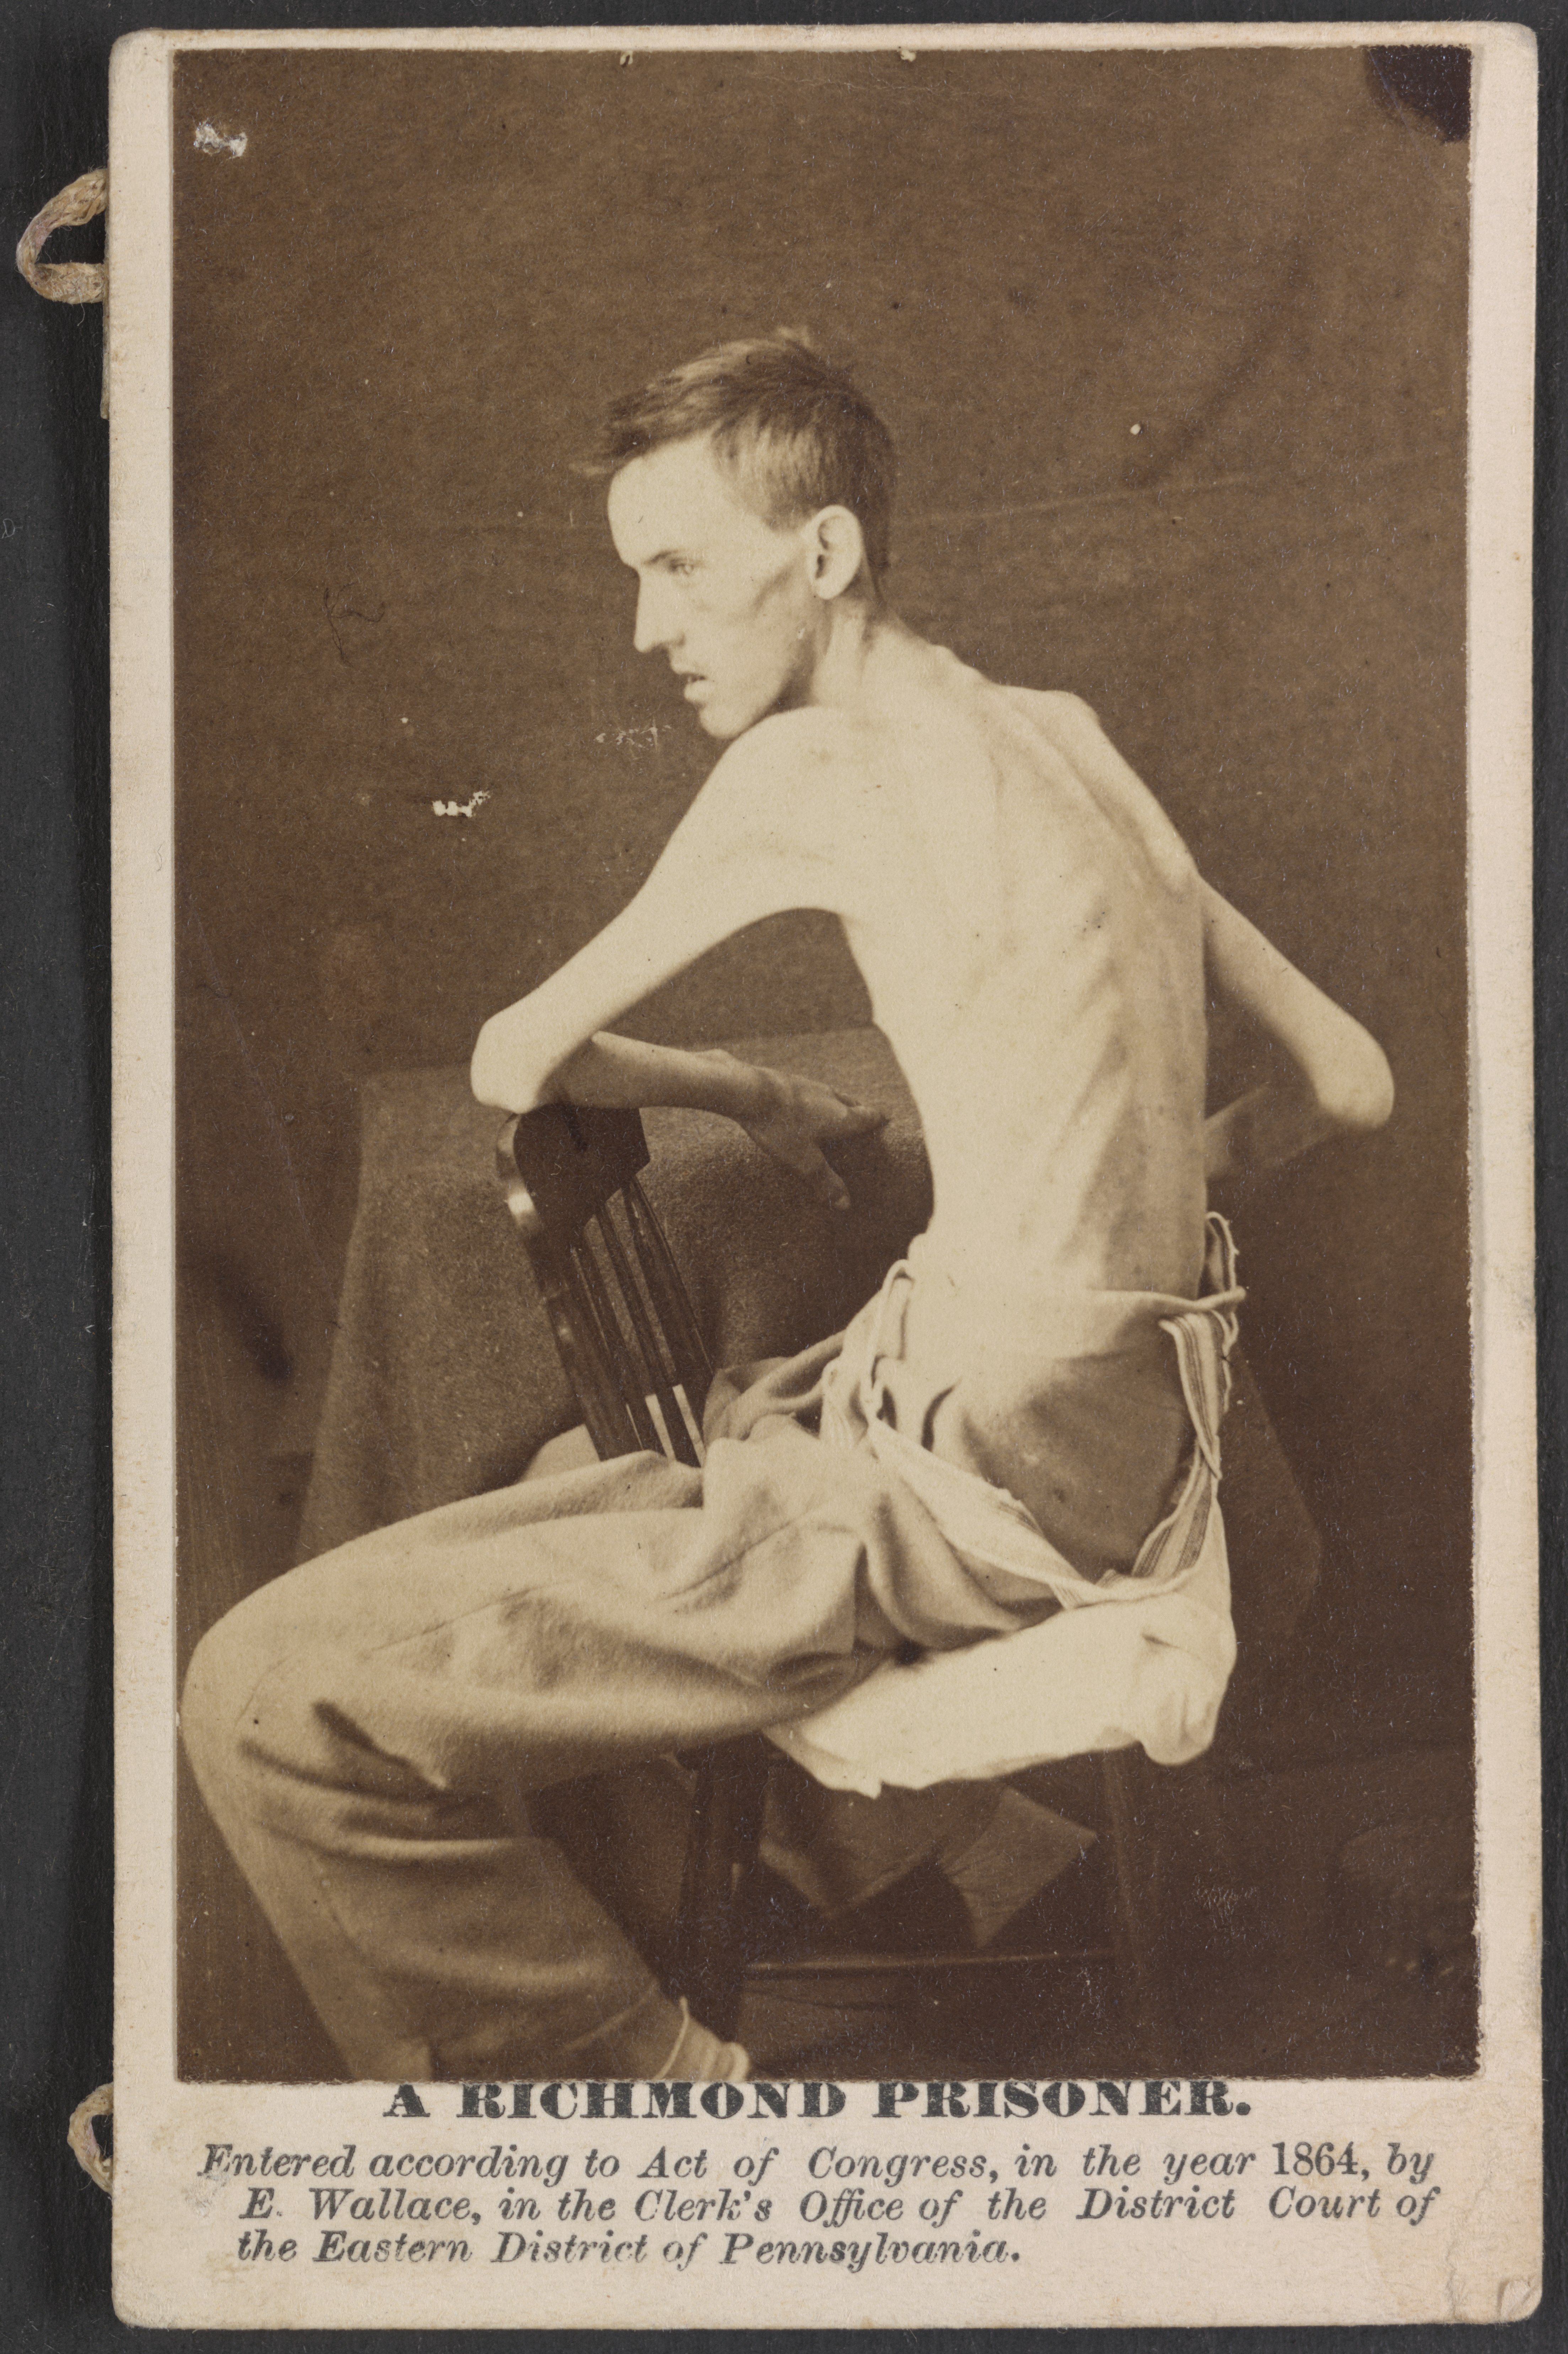 FileA Richmond Prisoner US General Hospital Div No 1 Annapolis Md Private Jackson O Broshears Ie Brashears Co D Indiana Mounted Infantry